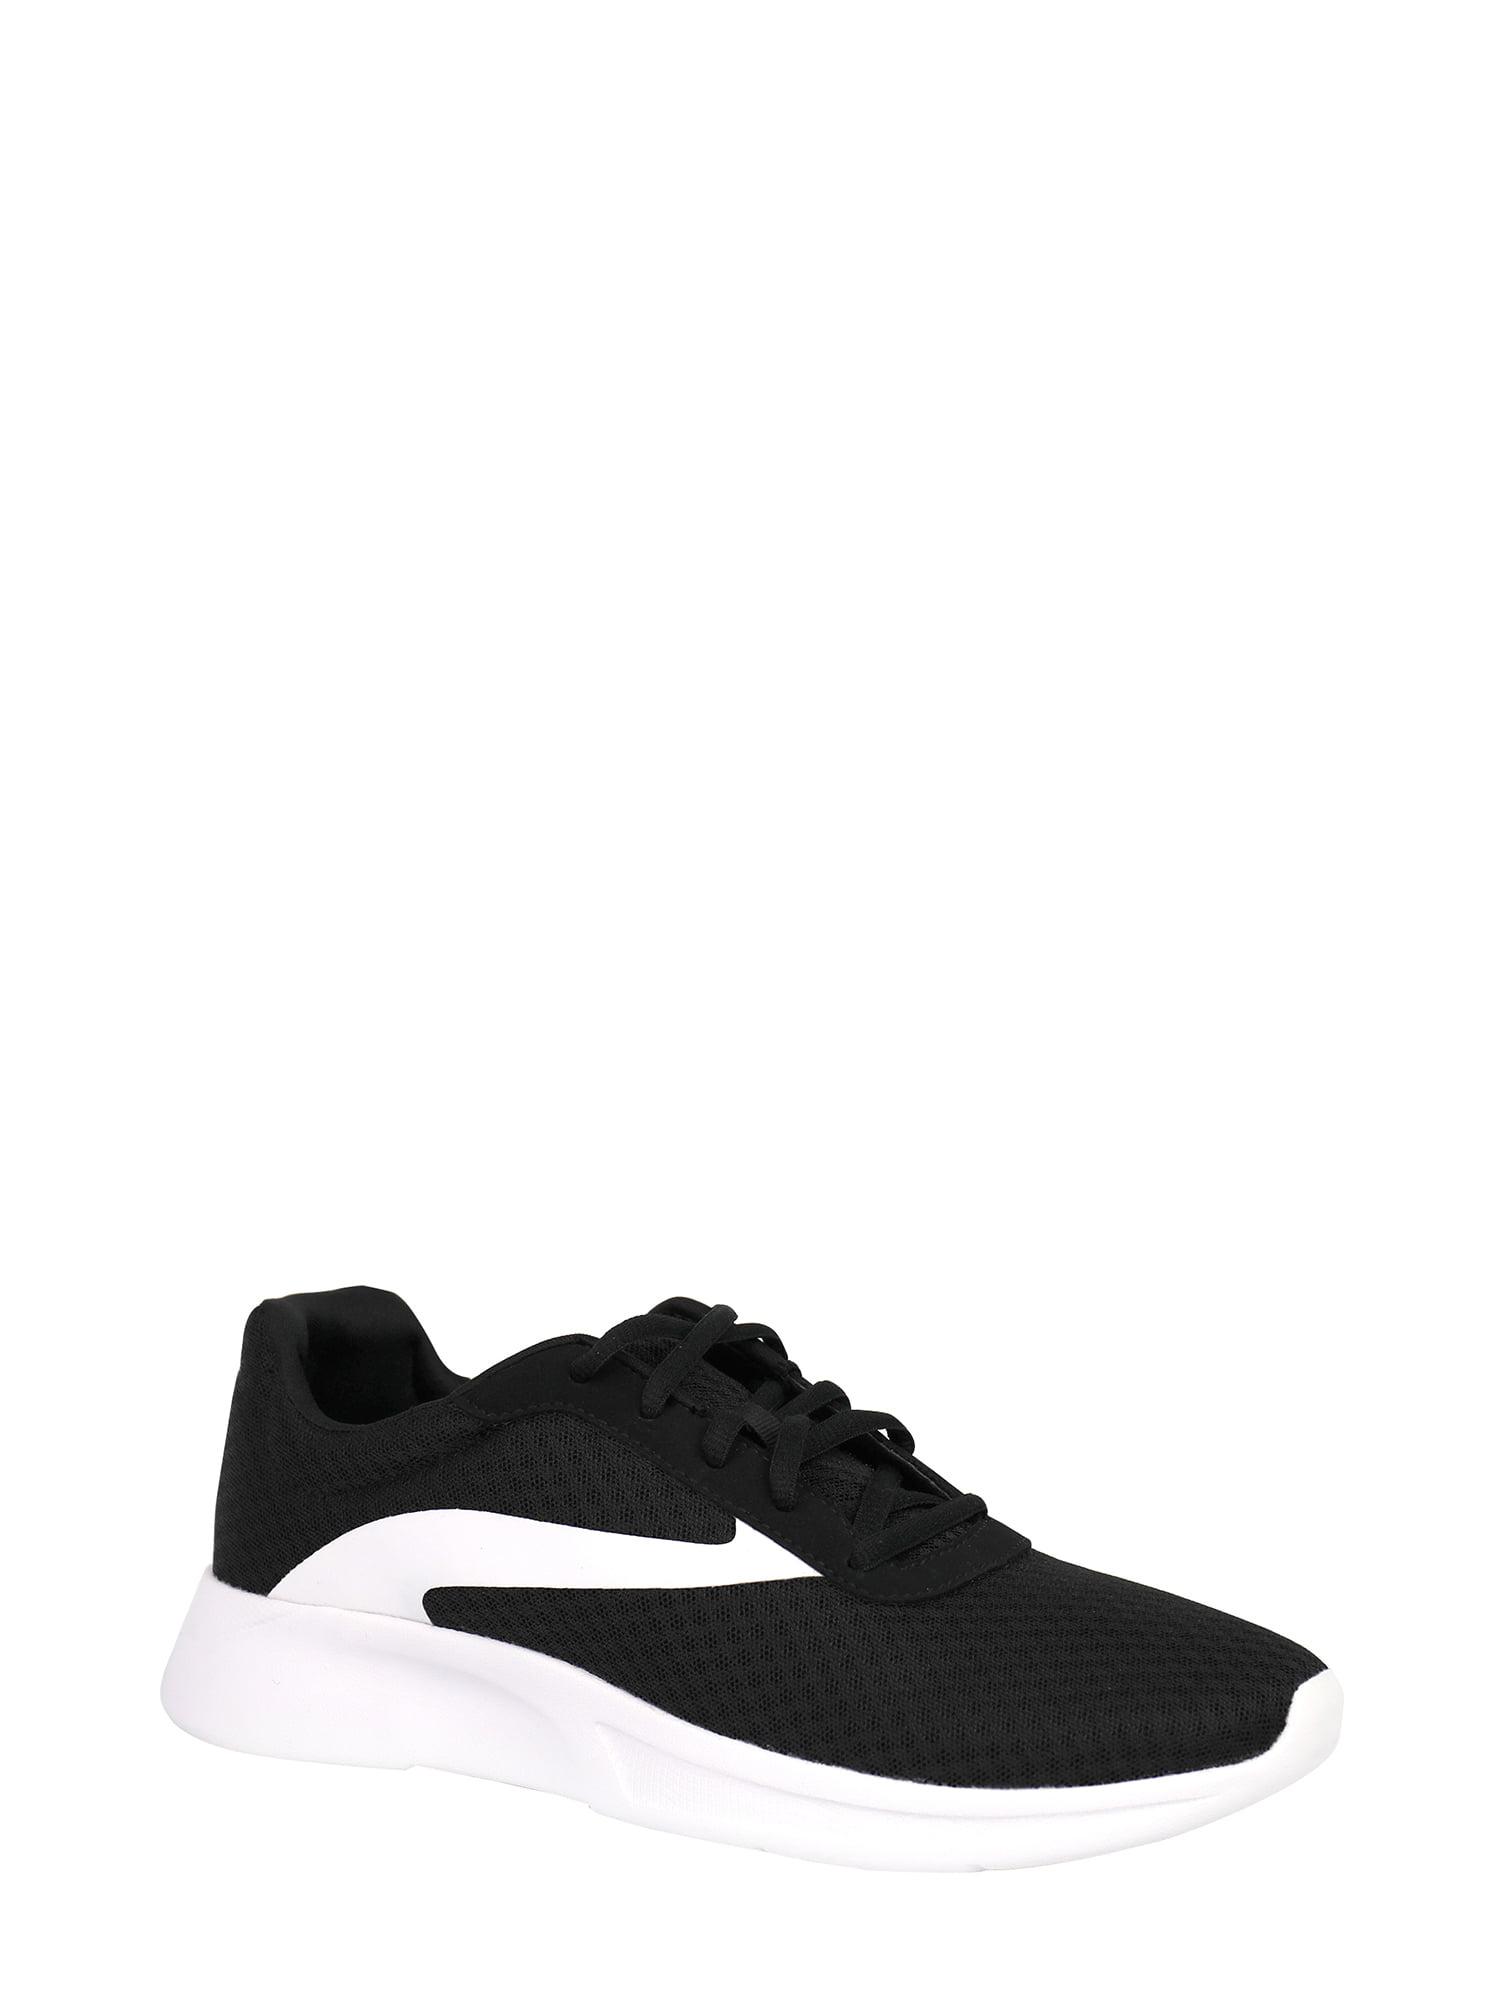 Athletic Shoe - Walmart